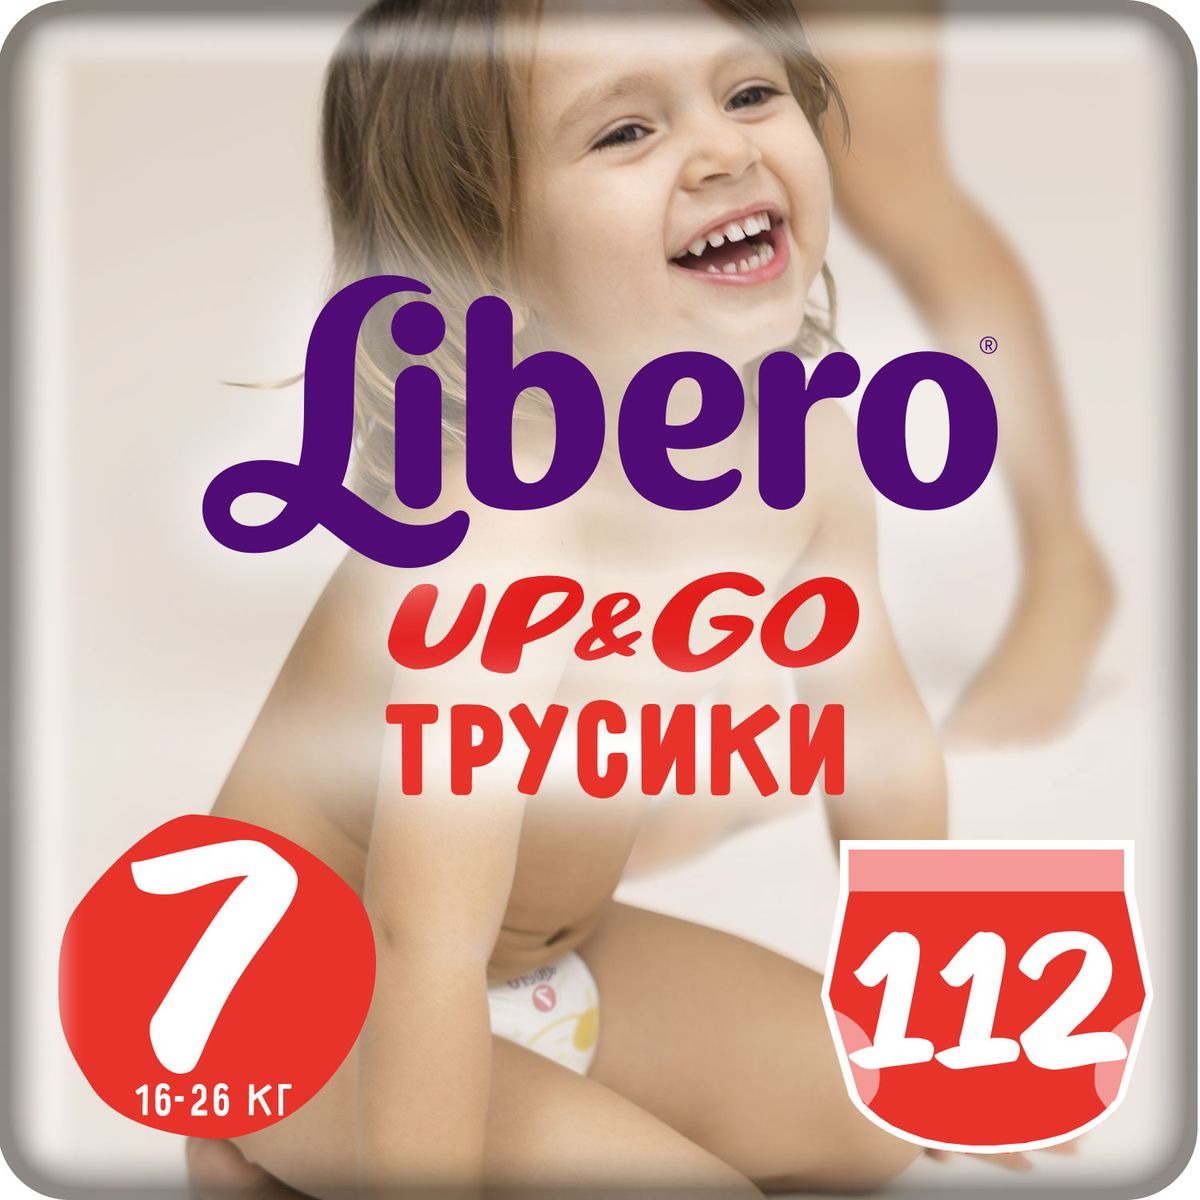 Трусики Libero Up&Go 7, 16-26 кг, 112 шт